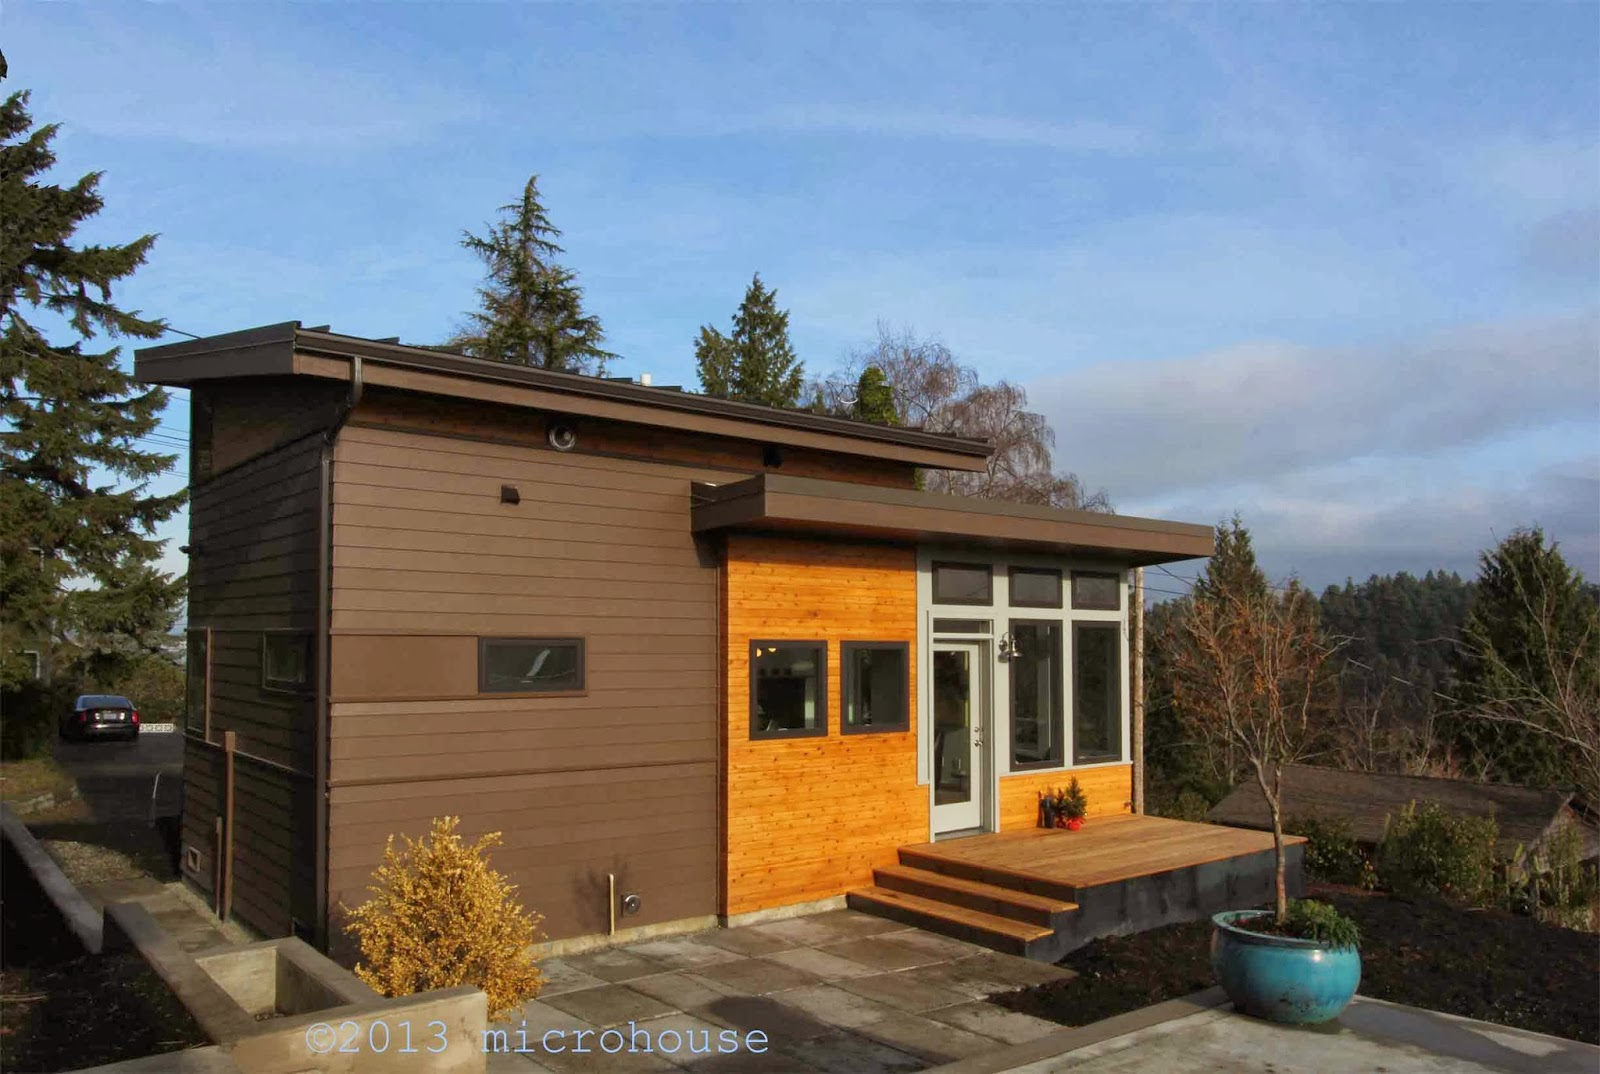 backyard cottage blog: a backyard cottage with a view